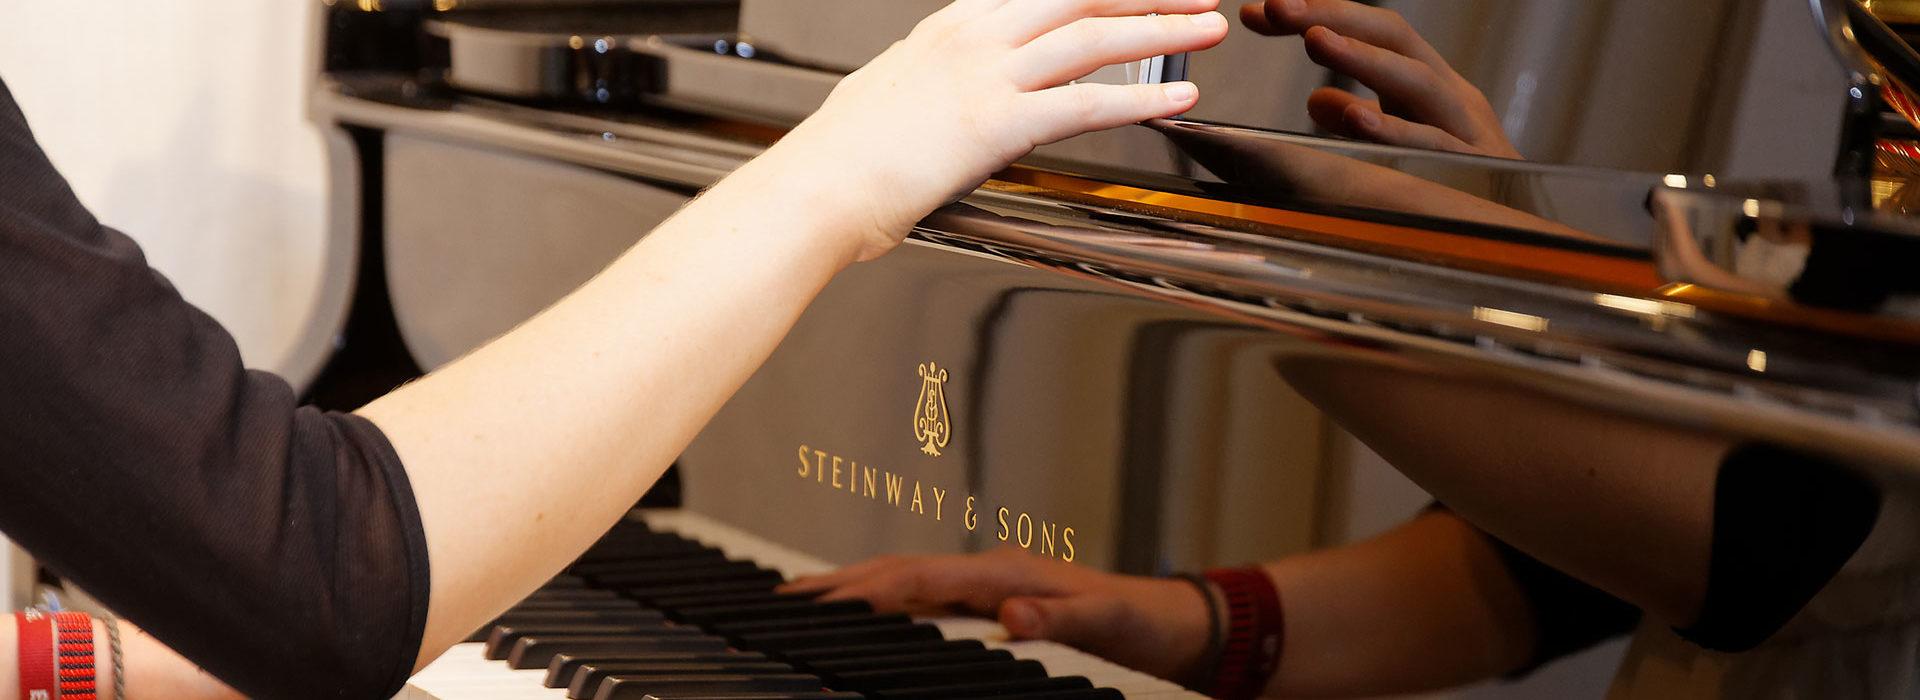 Pianohaus Bayreuth Kulmbach Klavierfachhandel 02g